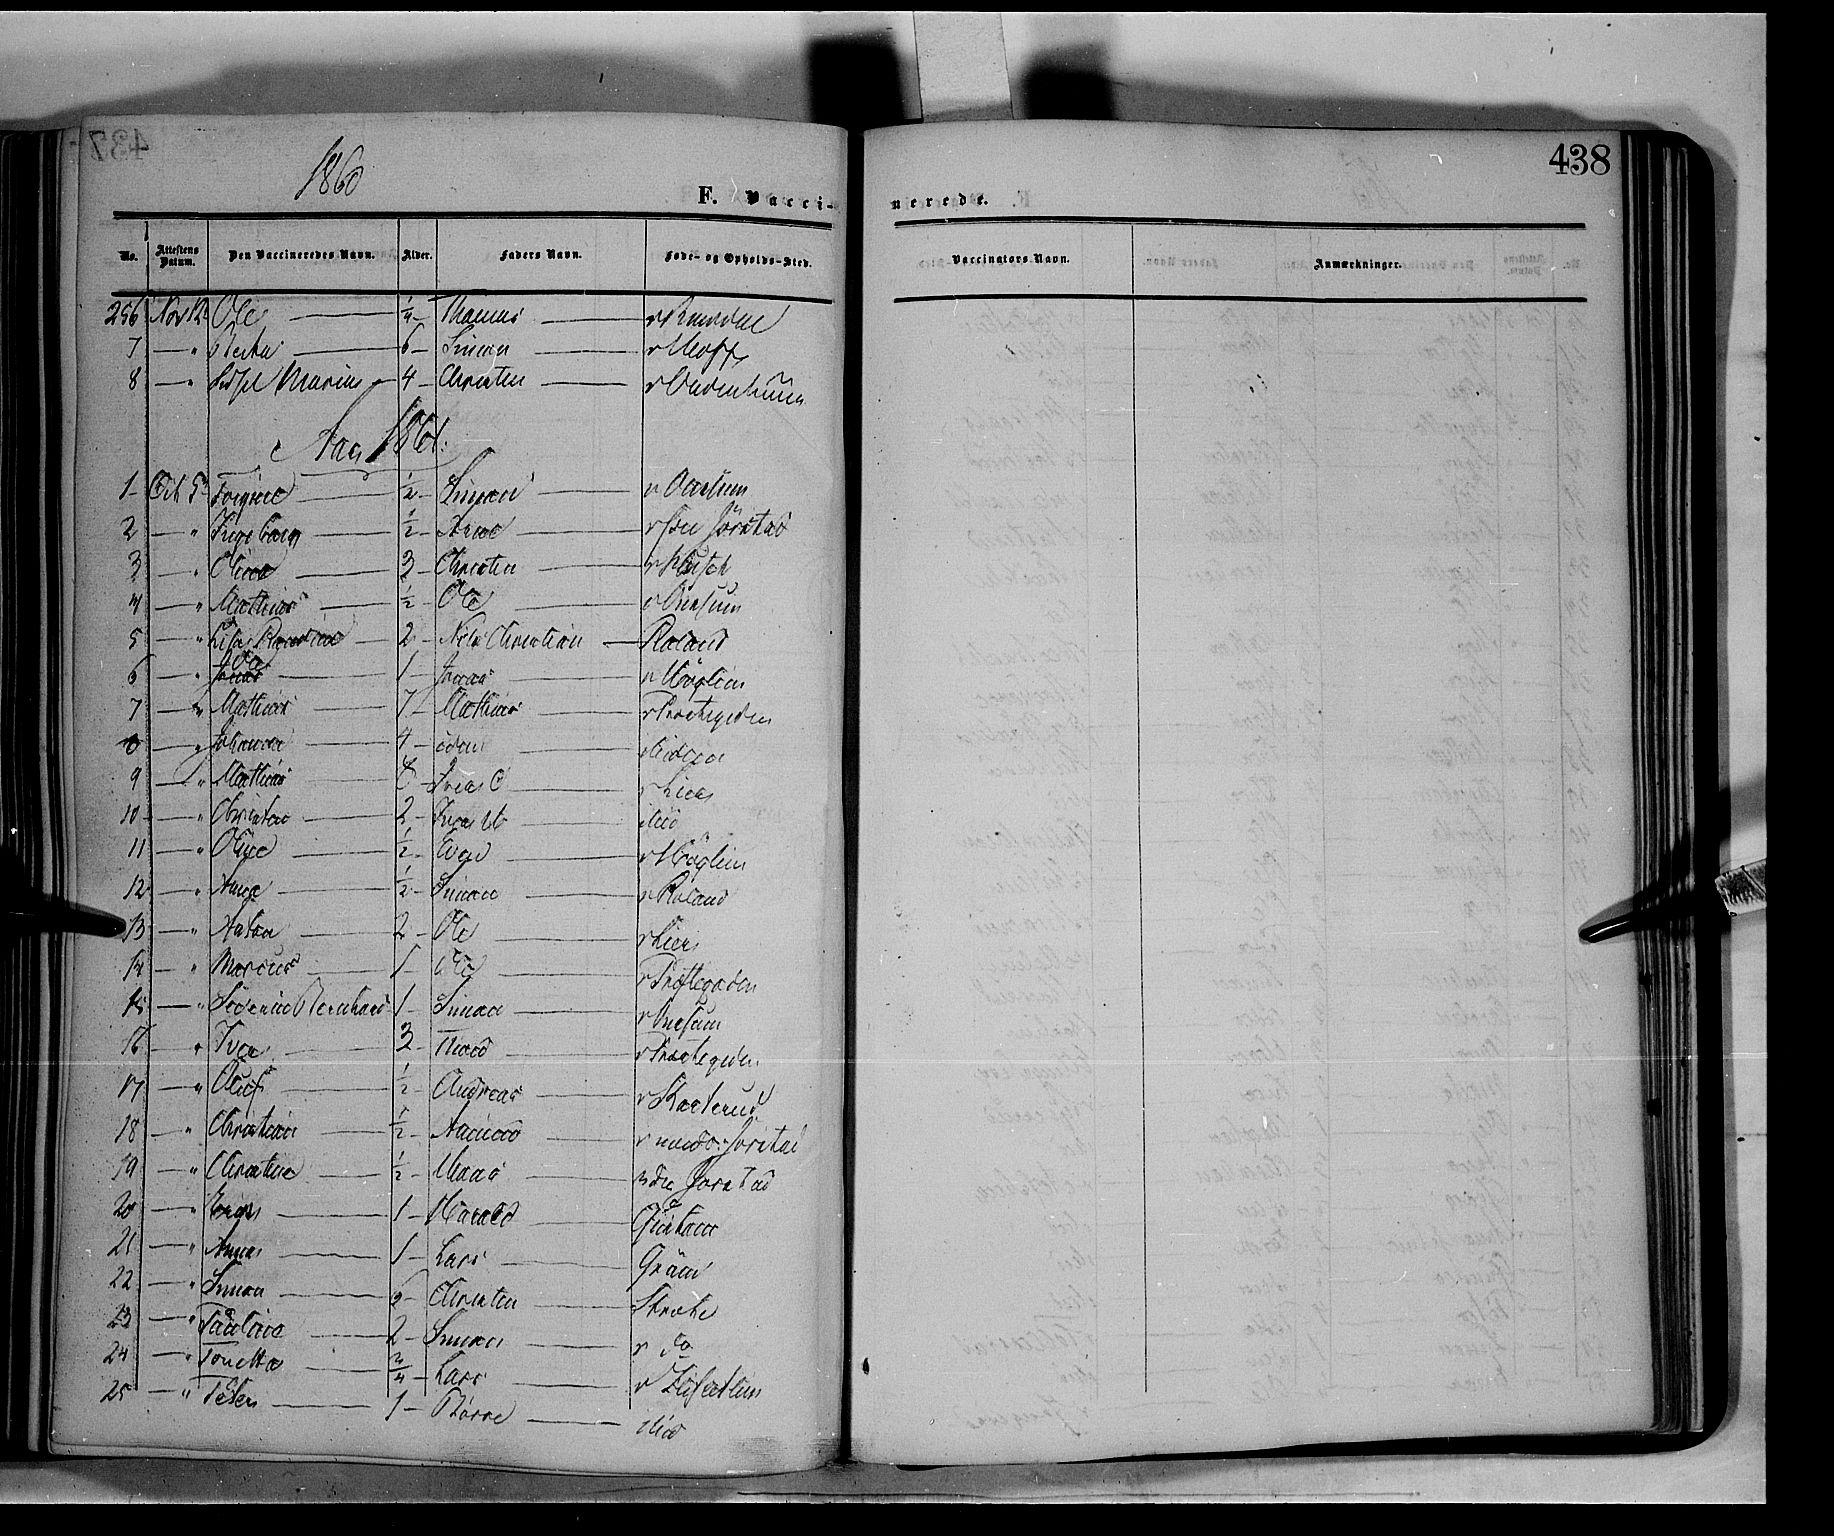 SAH, Fåberg prestekontor, Ministerialbok nr. 6B, 1855-1867, s. 438